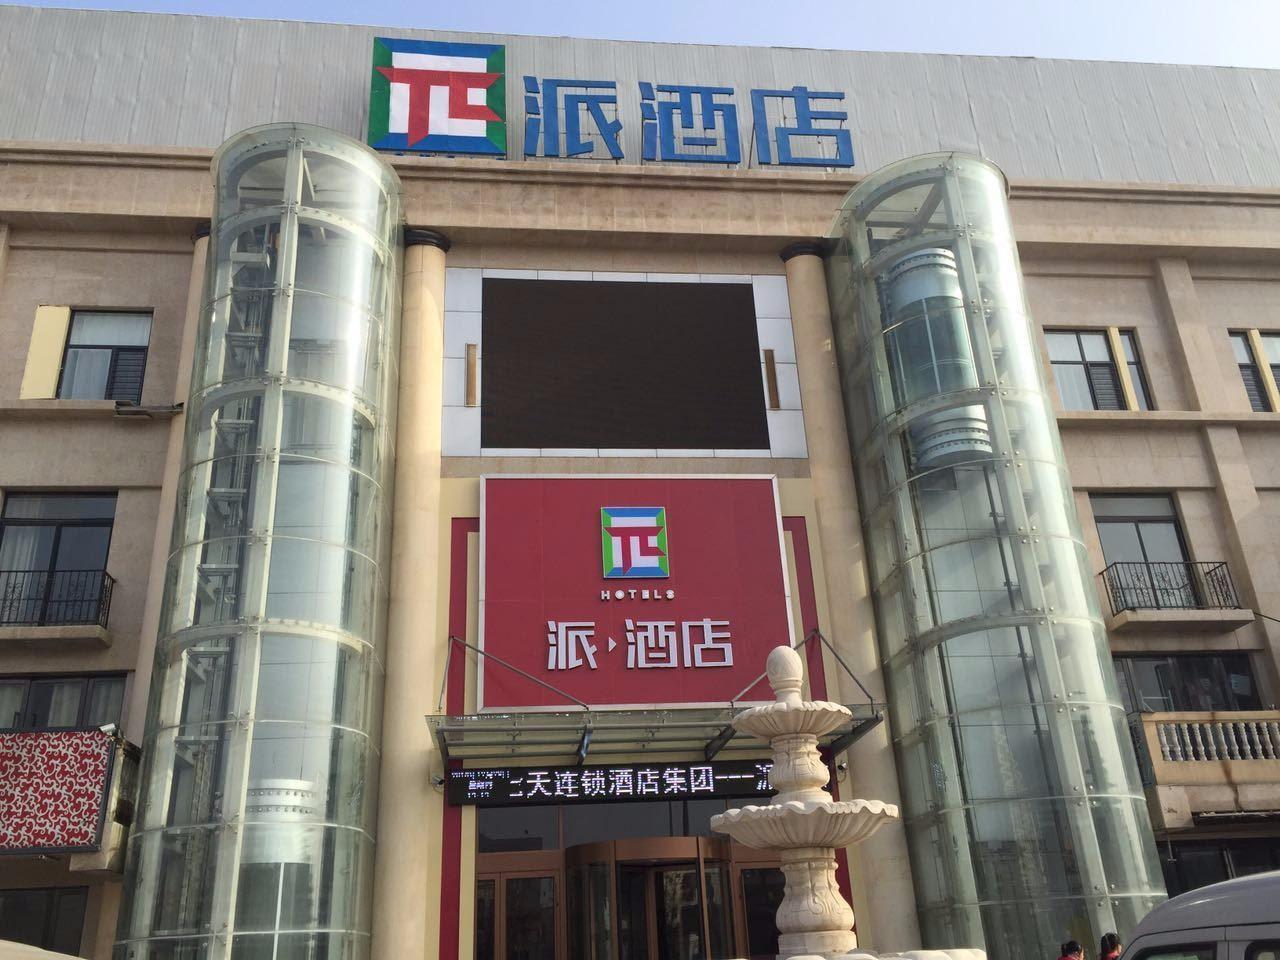 Pai Hotel Heze Shan County Cultural Road Heze University Reviews